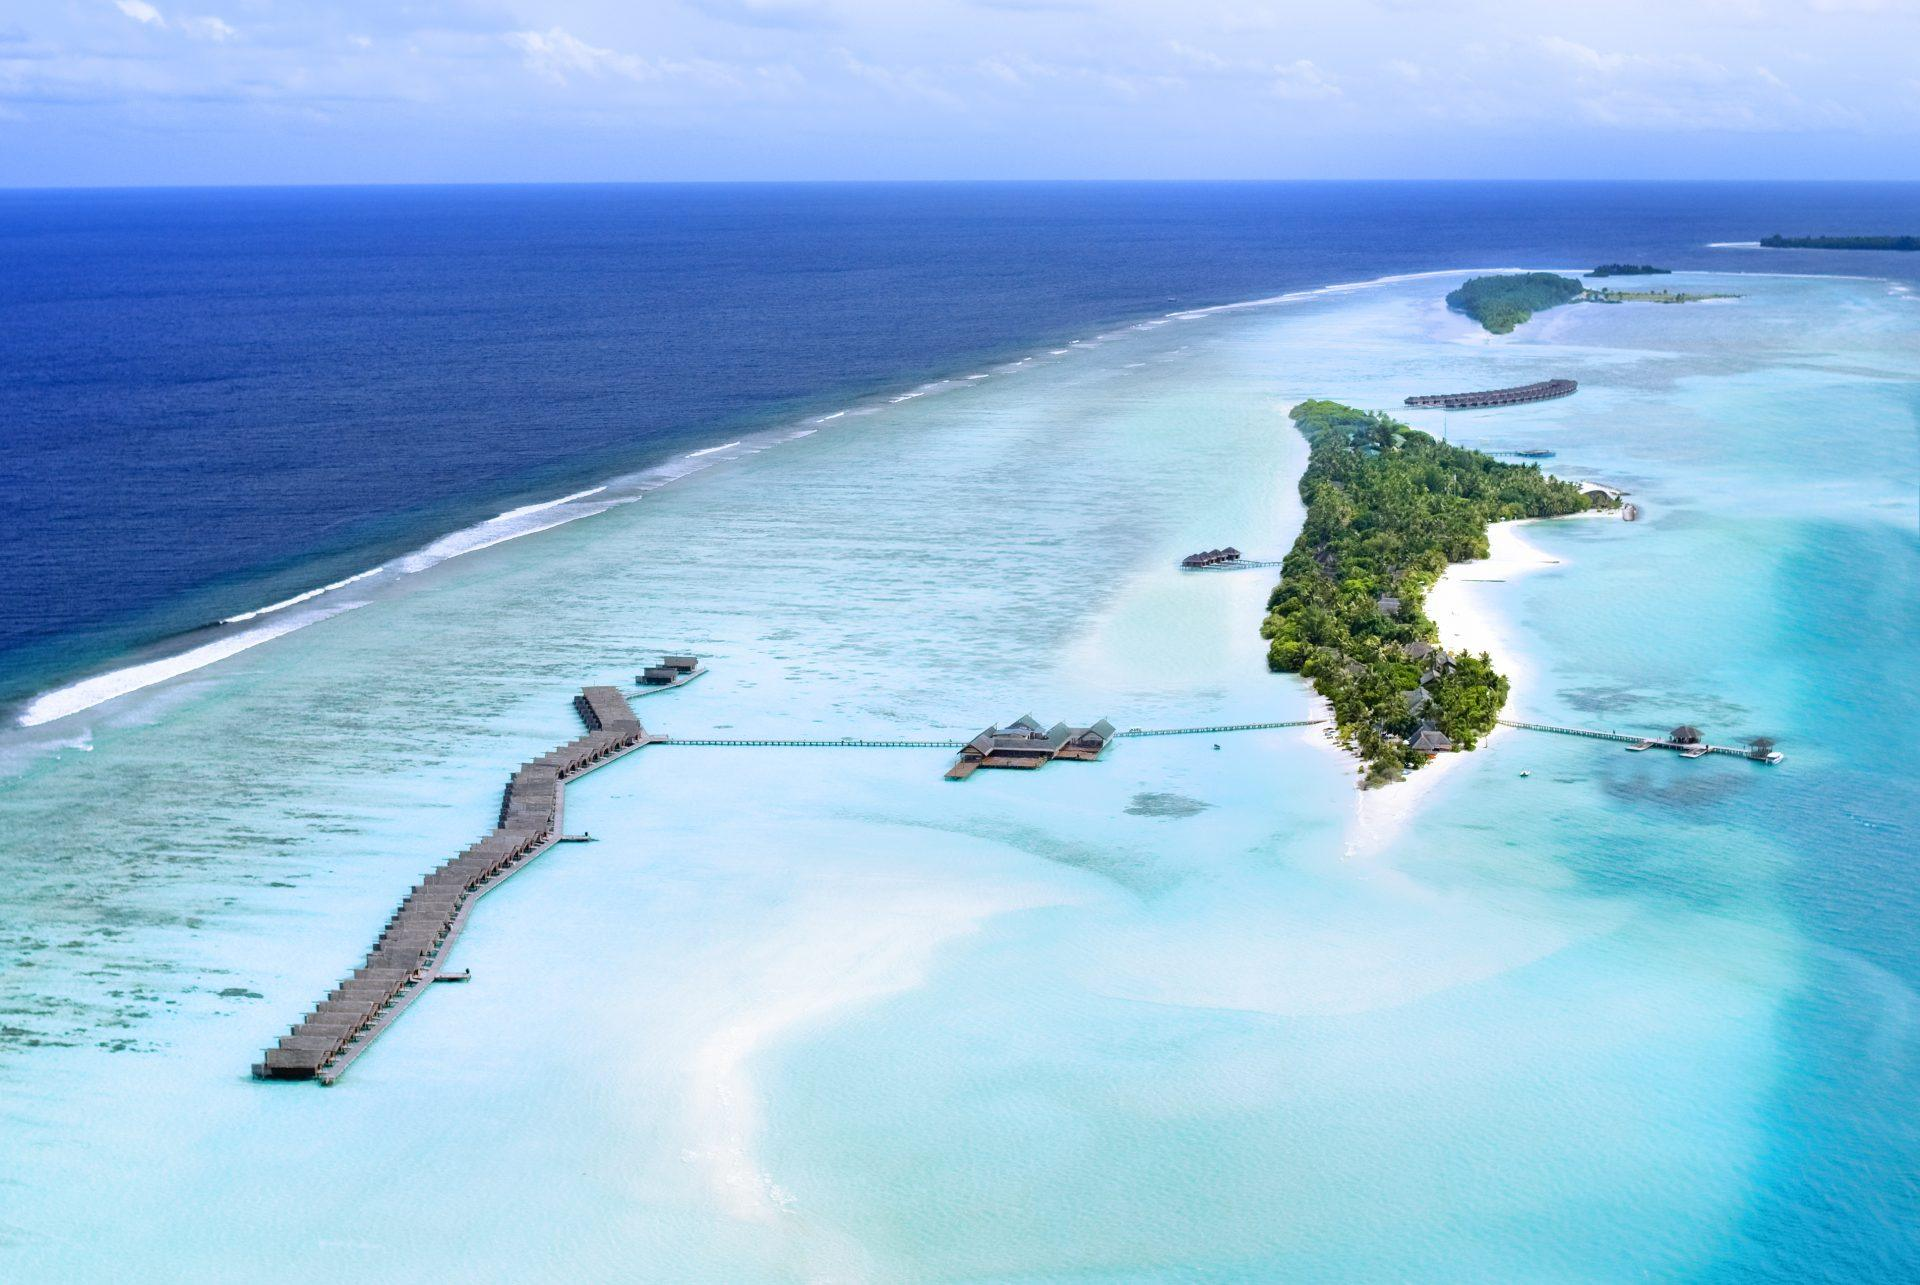 LSAA AERIAL 1 1920x1285 - LUX* South Ari Atoll Resort & Villas, Malediven